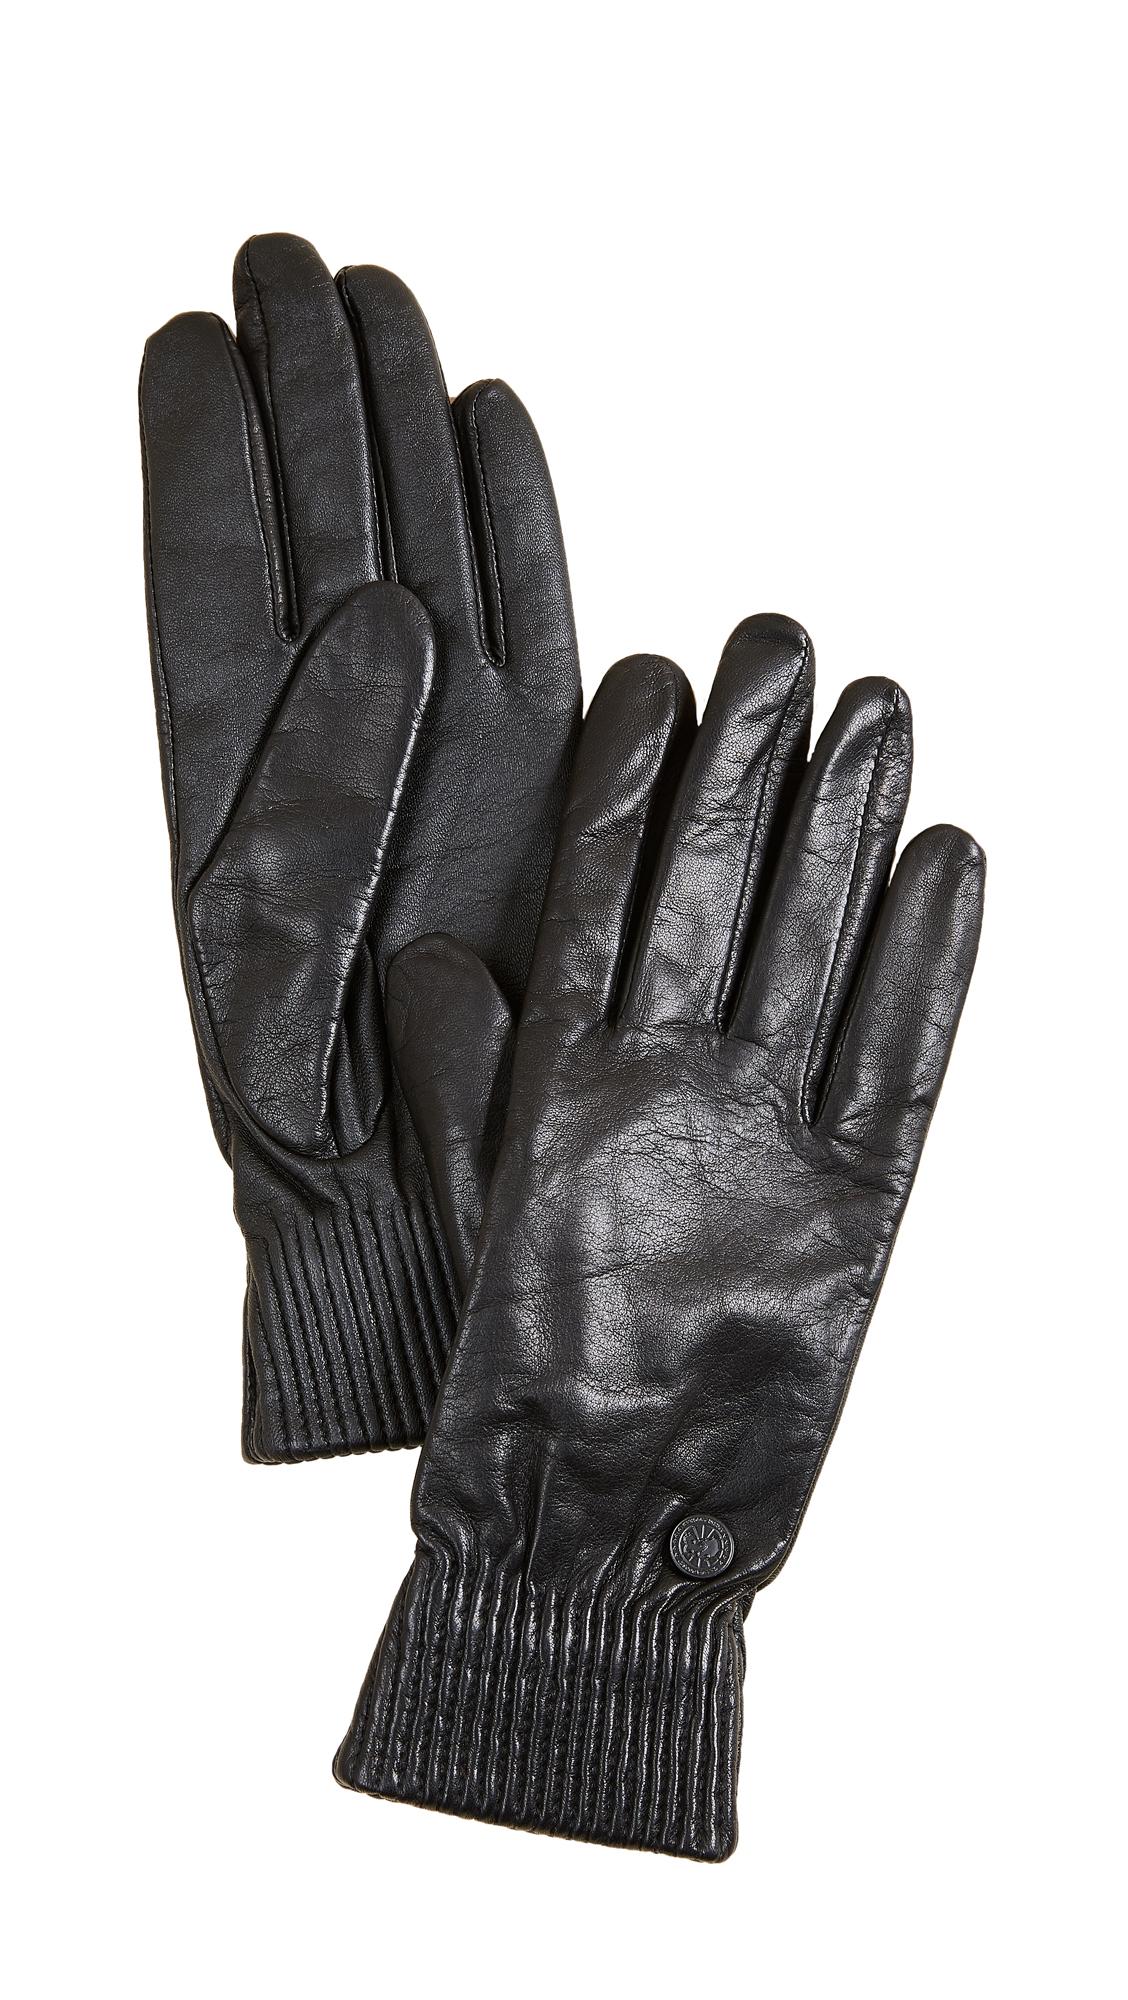 Canada Goose Leather Rib Tech Gloves - Black